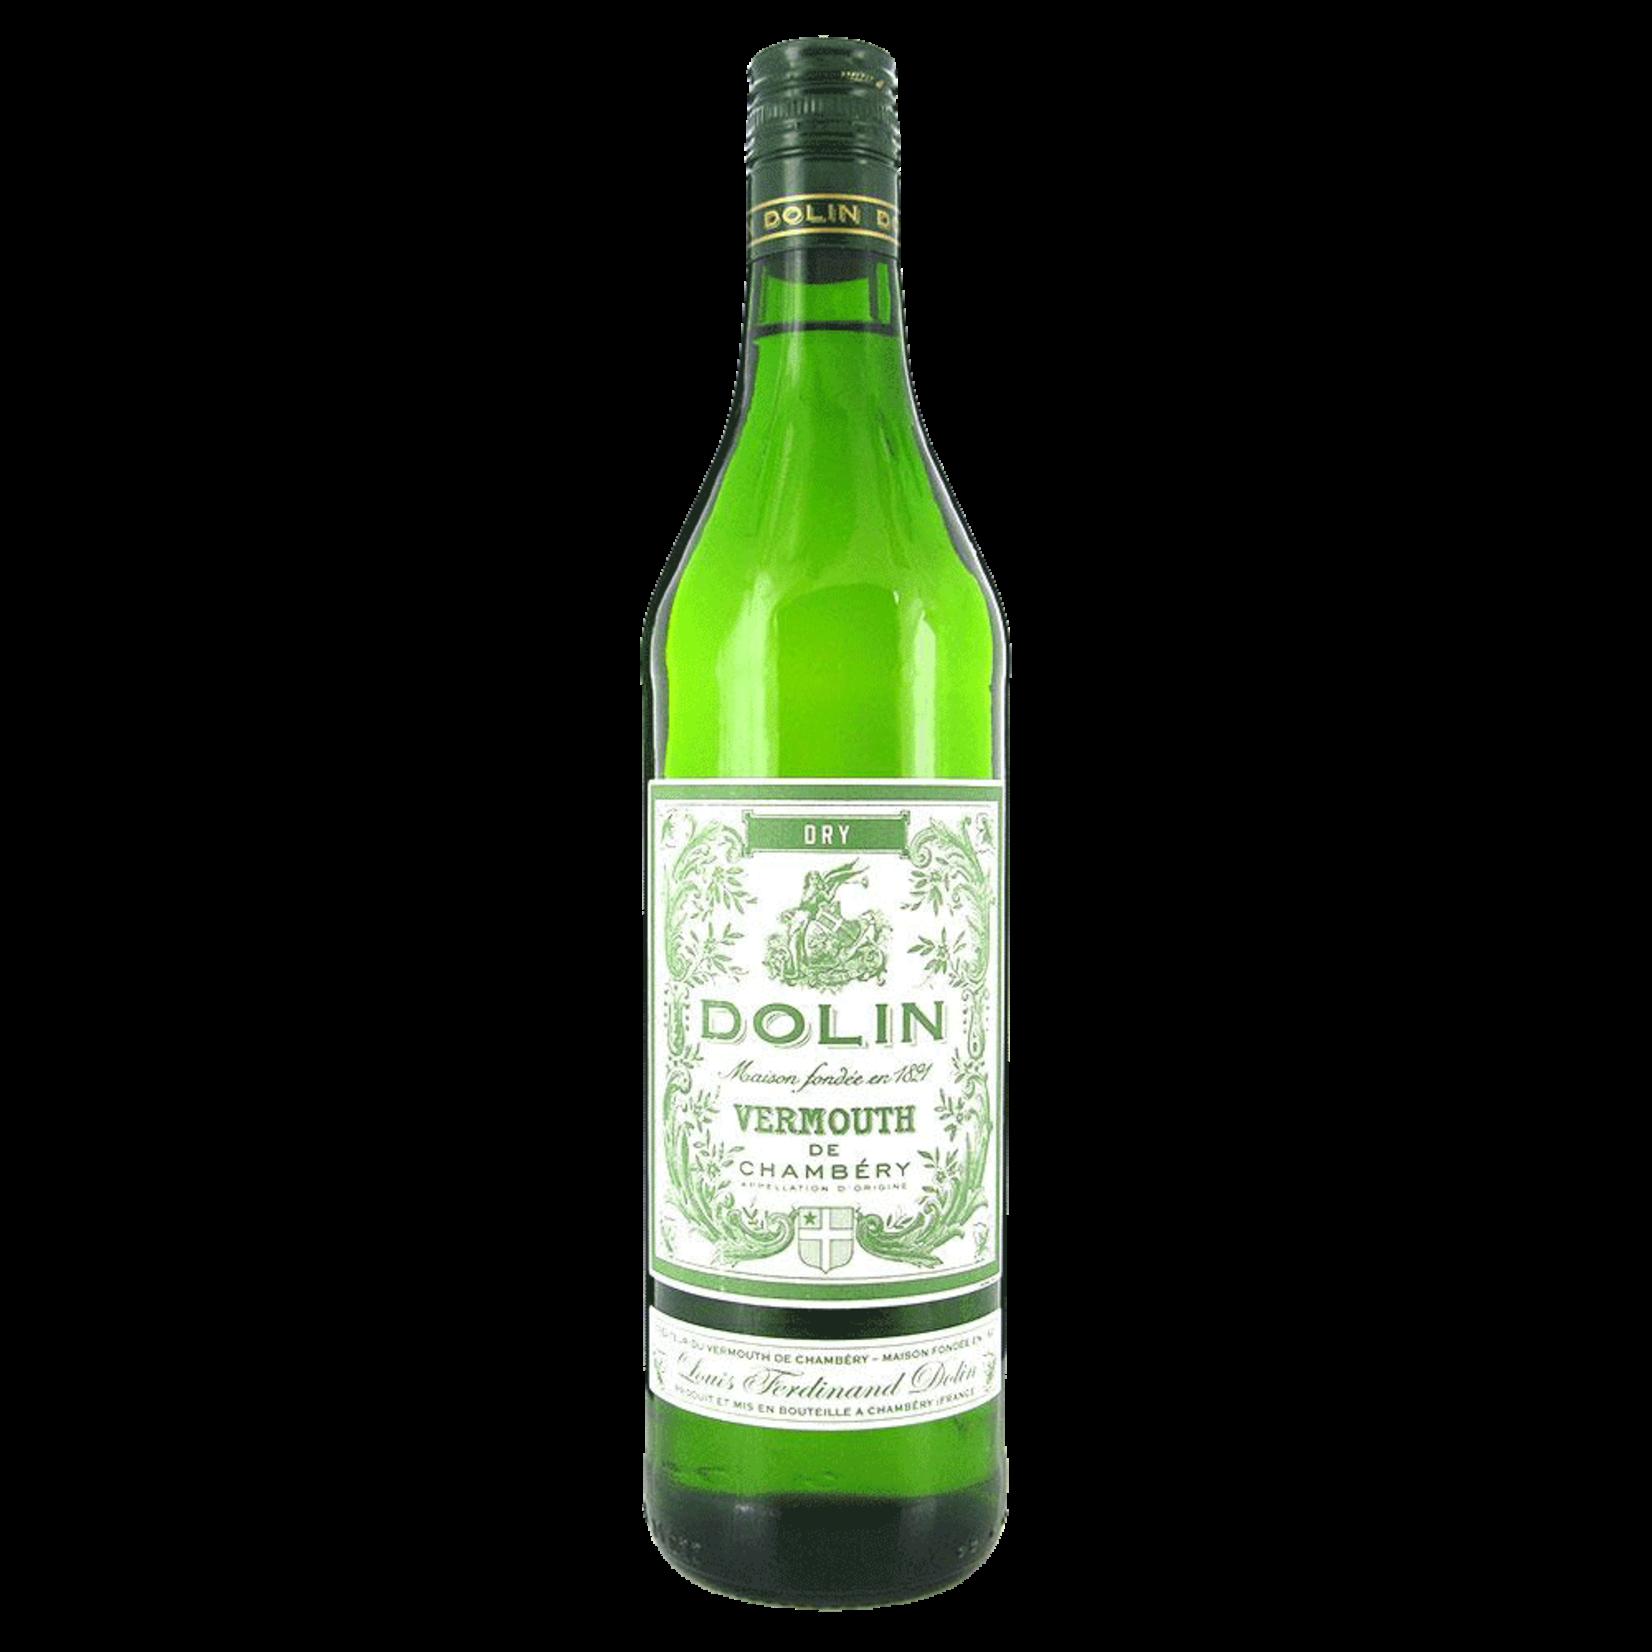 Wine Dolin Dry Vermouth de Chambéry 375ml